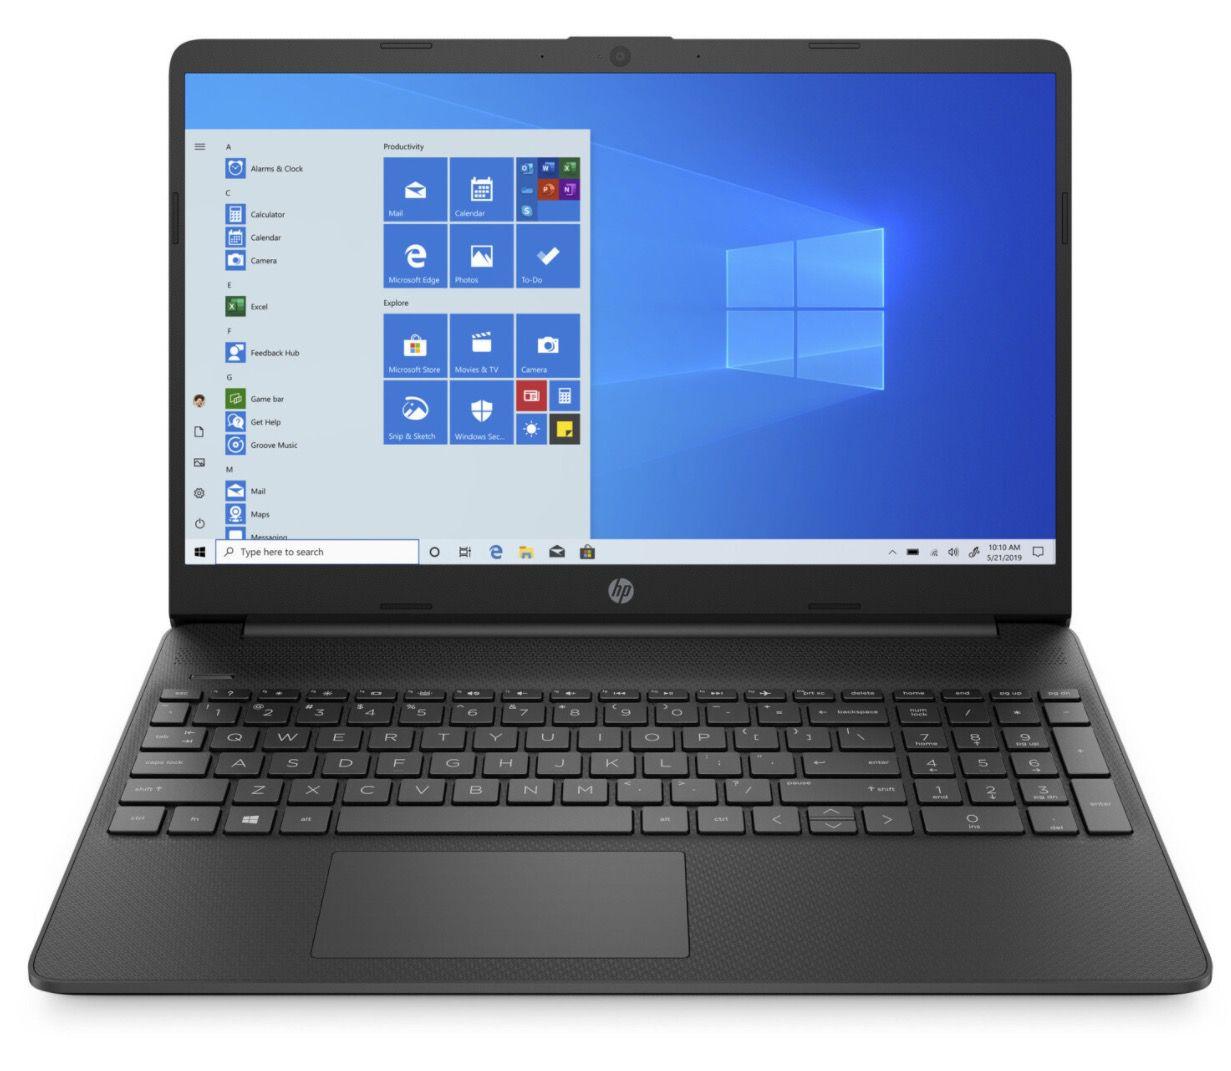 Asus Pro Essential P550LAV XO1047H   15,6 Notebook mit i5 + 500GB + 8 GB RAM für 473,99€